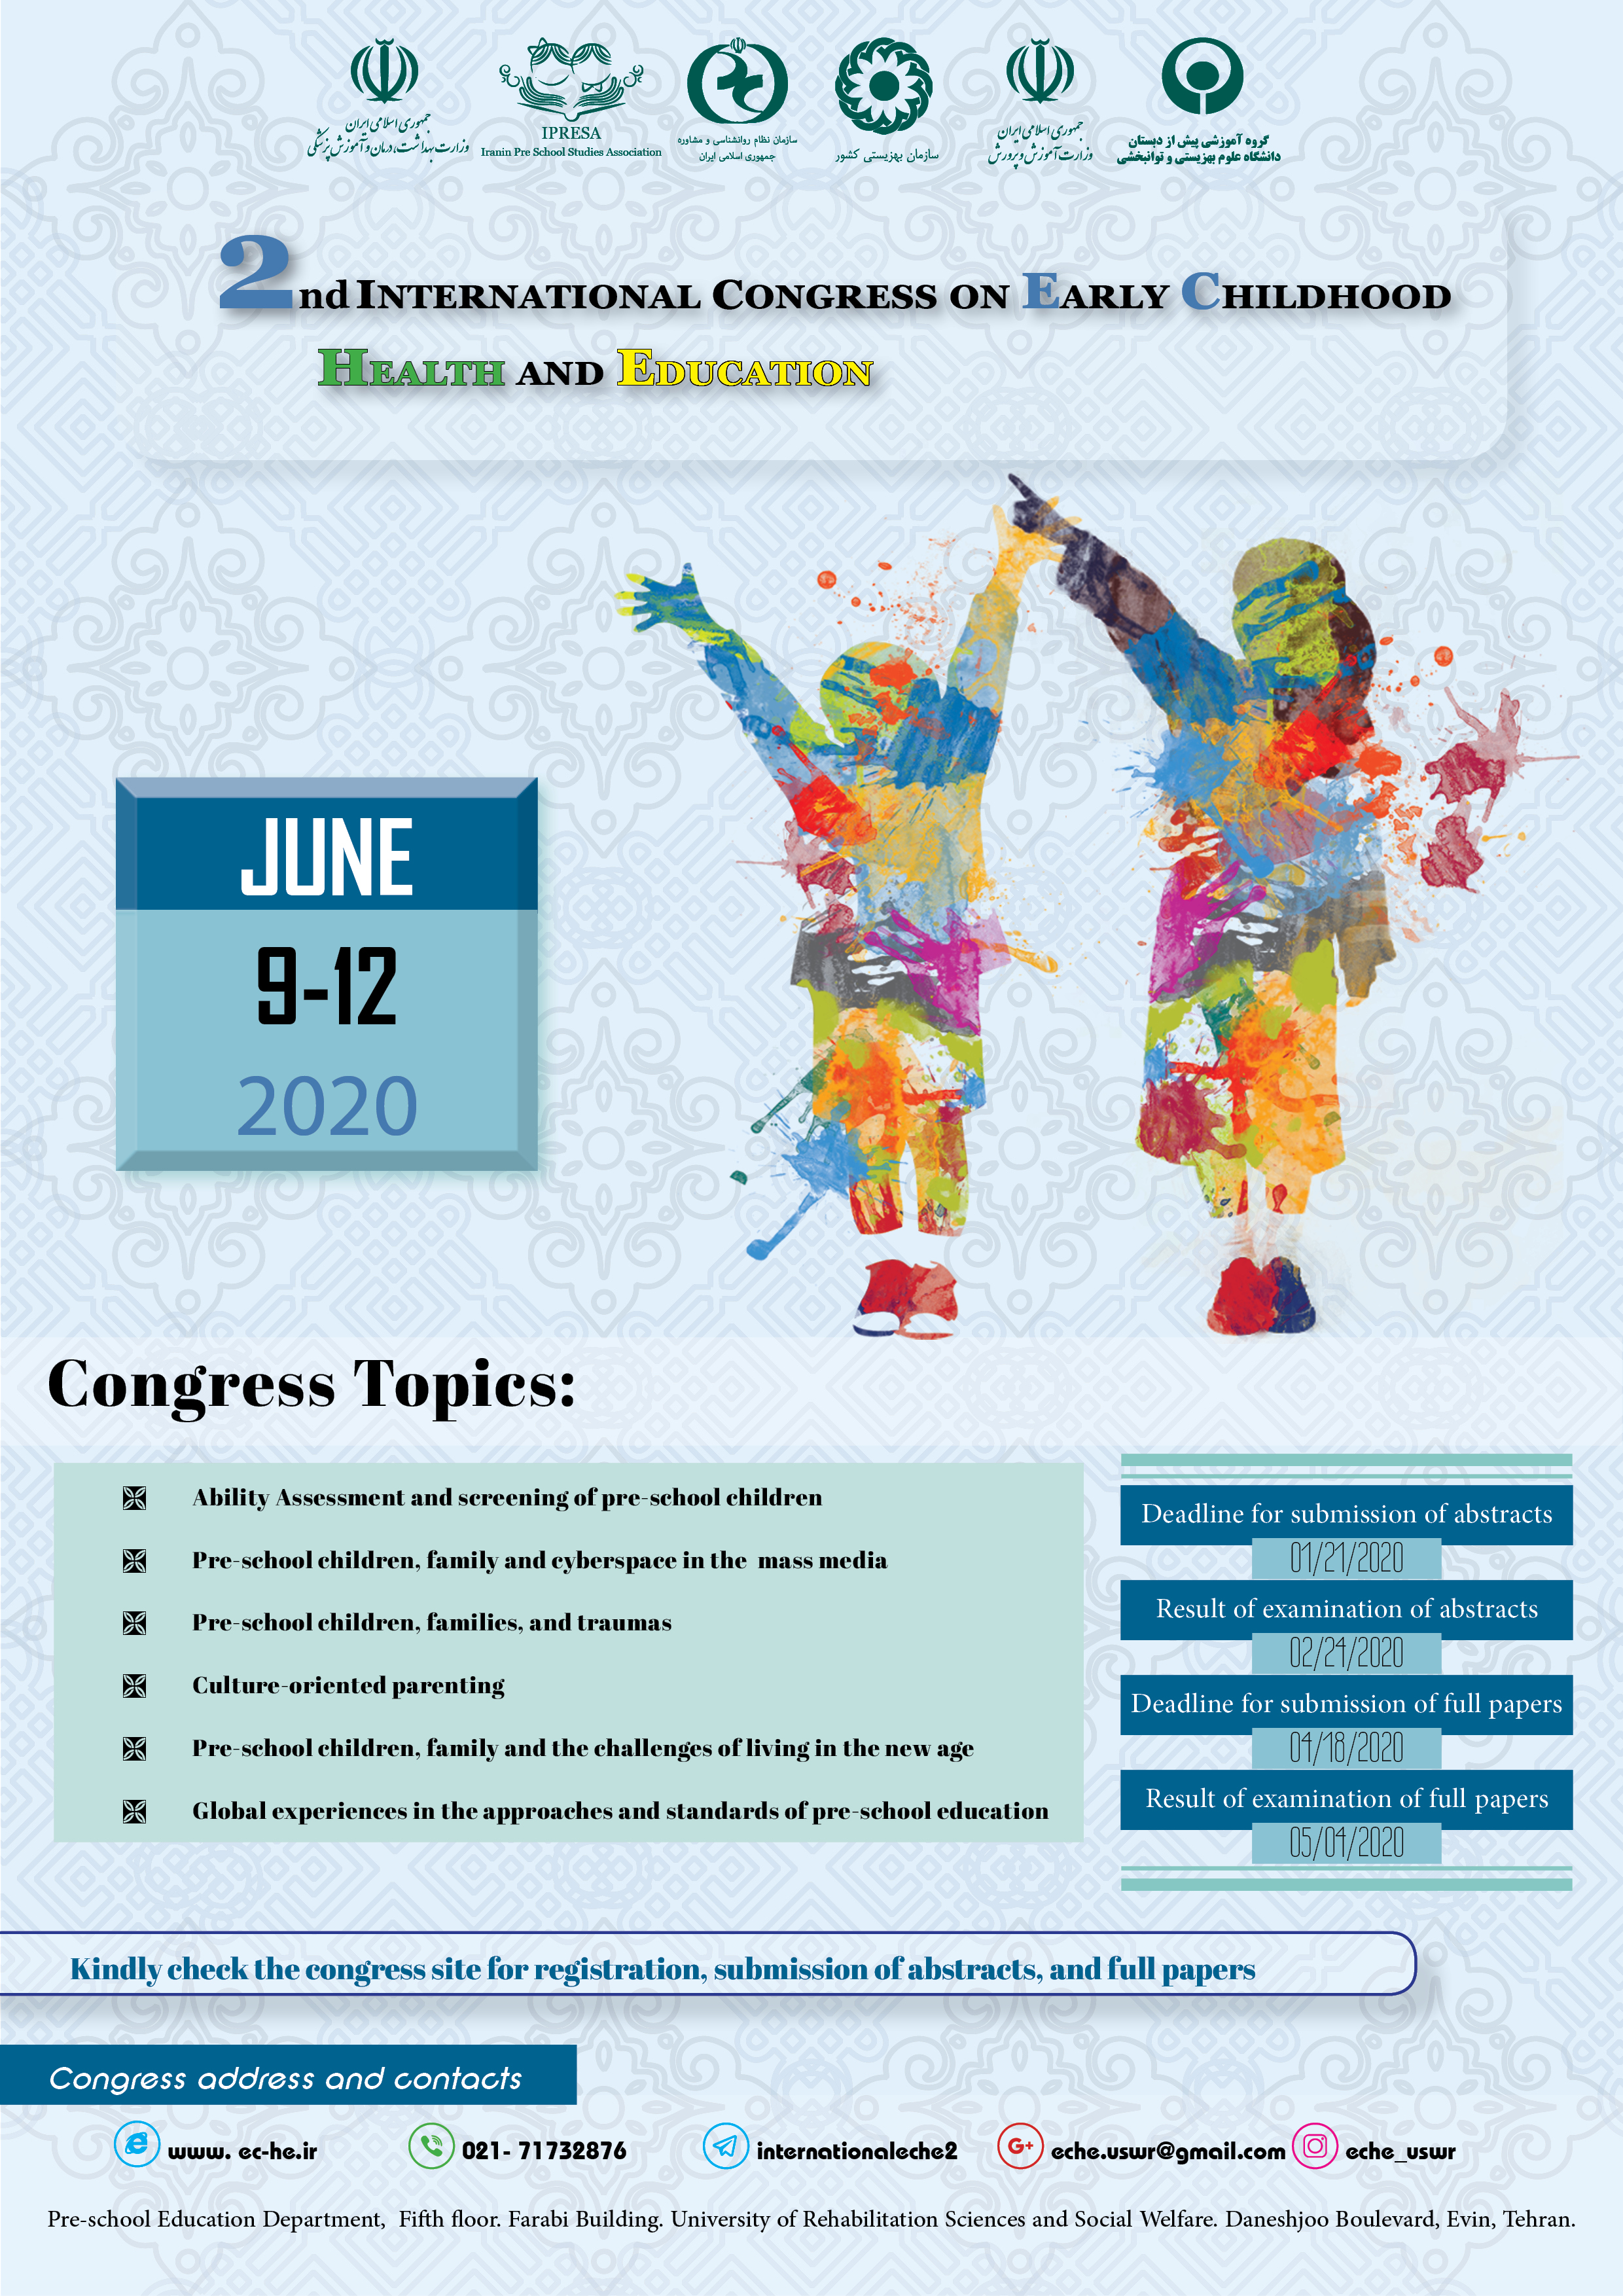 english - دومین کنگره بین المللی آموزش و سلامت کودکان پیش از دبستان خرداد 99